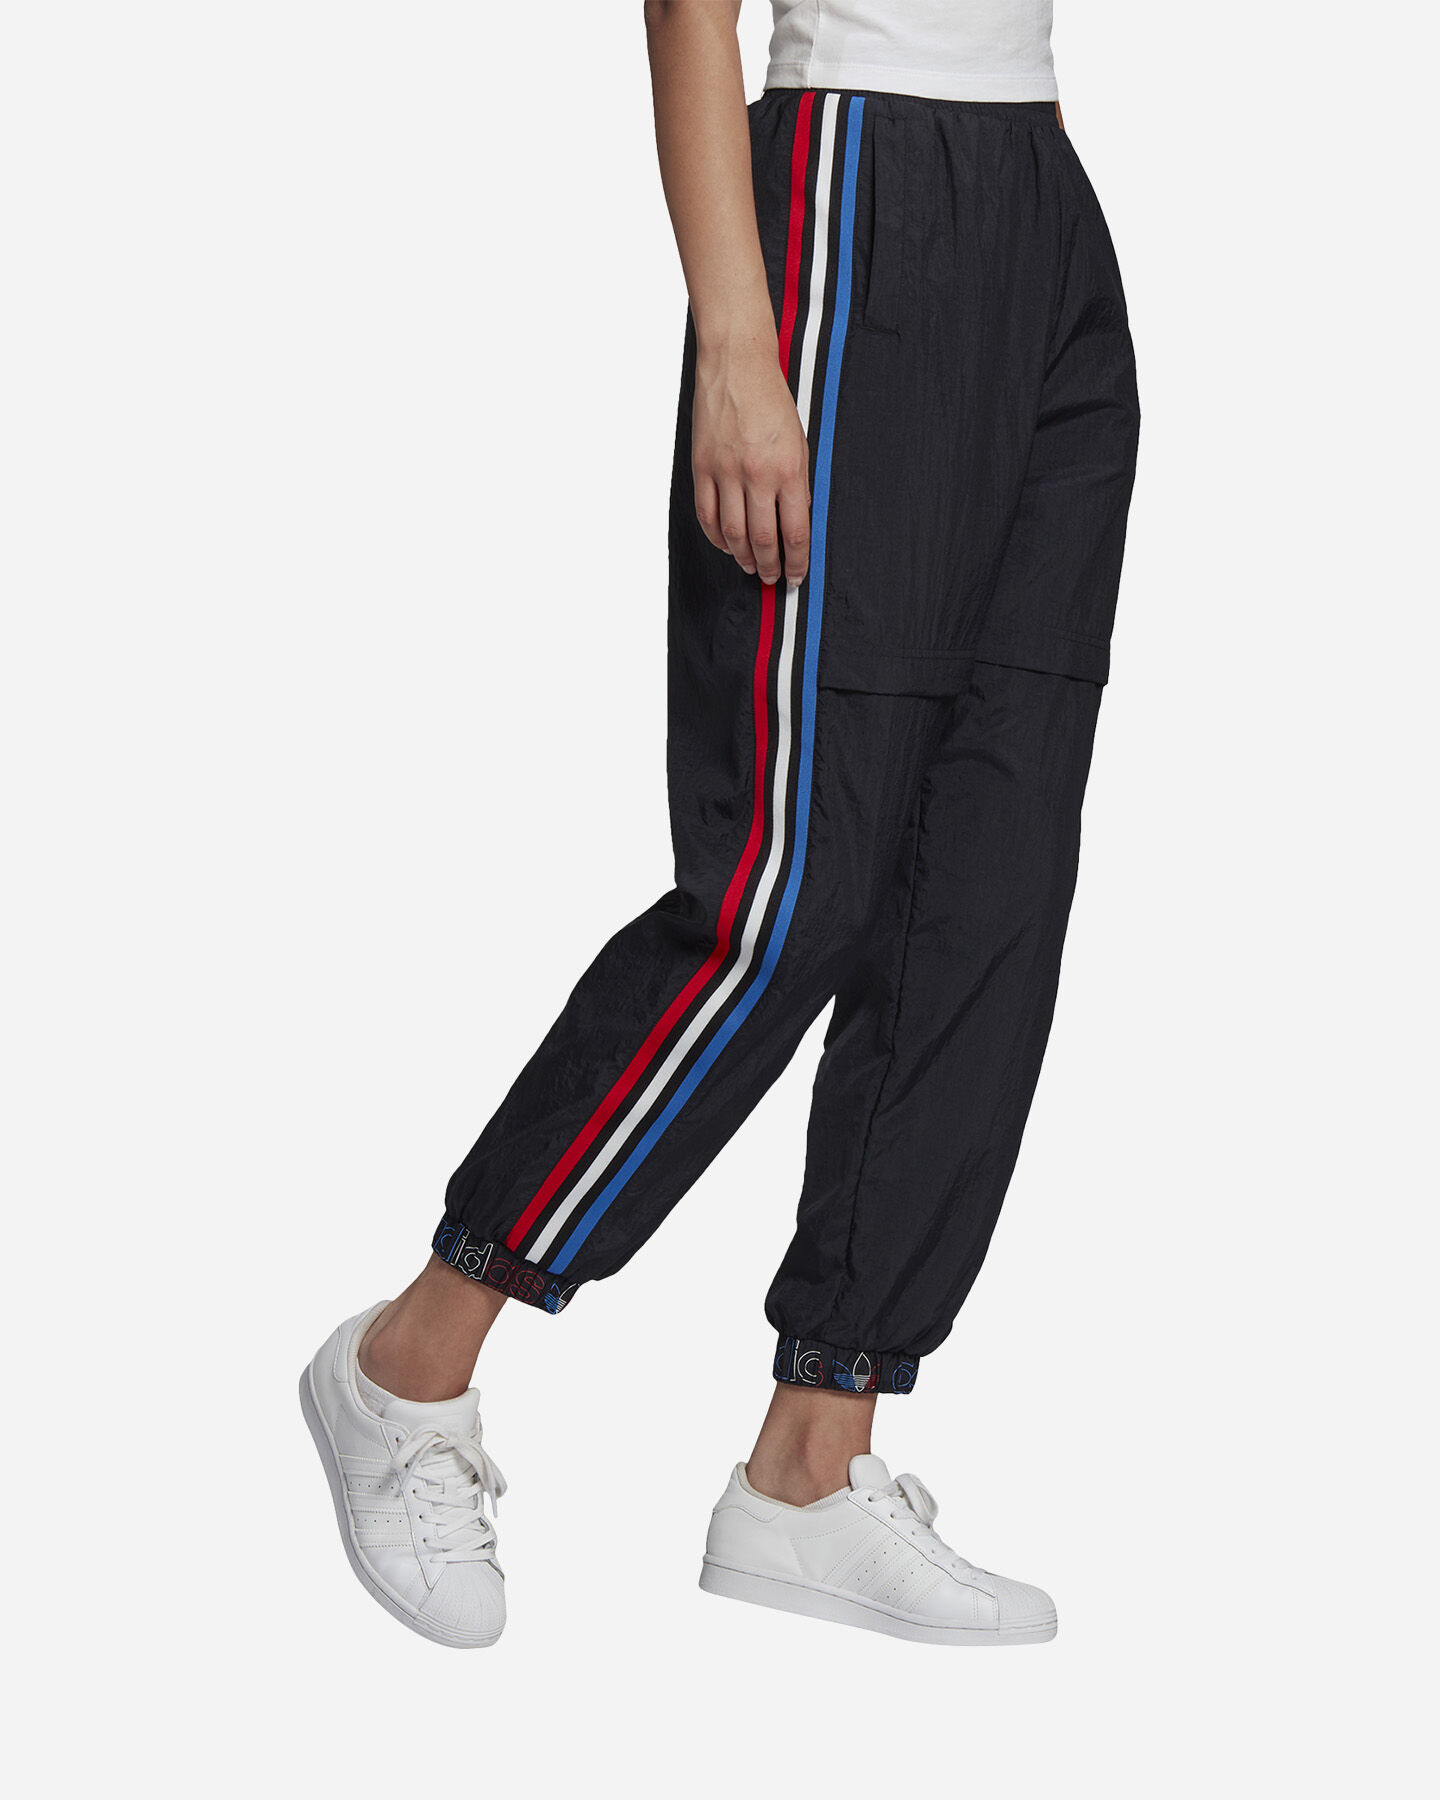 Pantalone ADIDAS ADICOLOR TRICOLOR JAPONA W S5272950 scatto 3